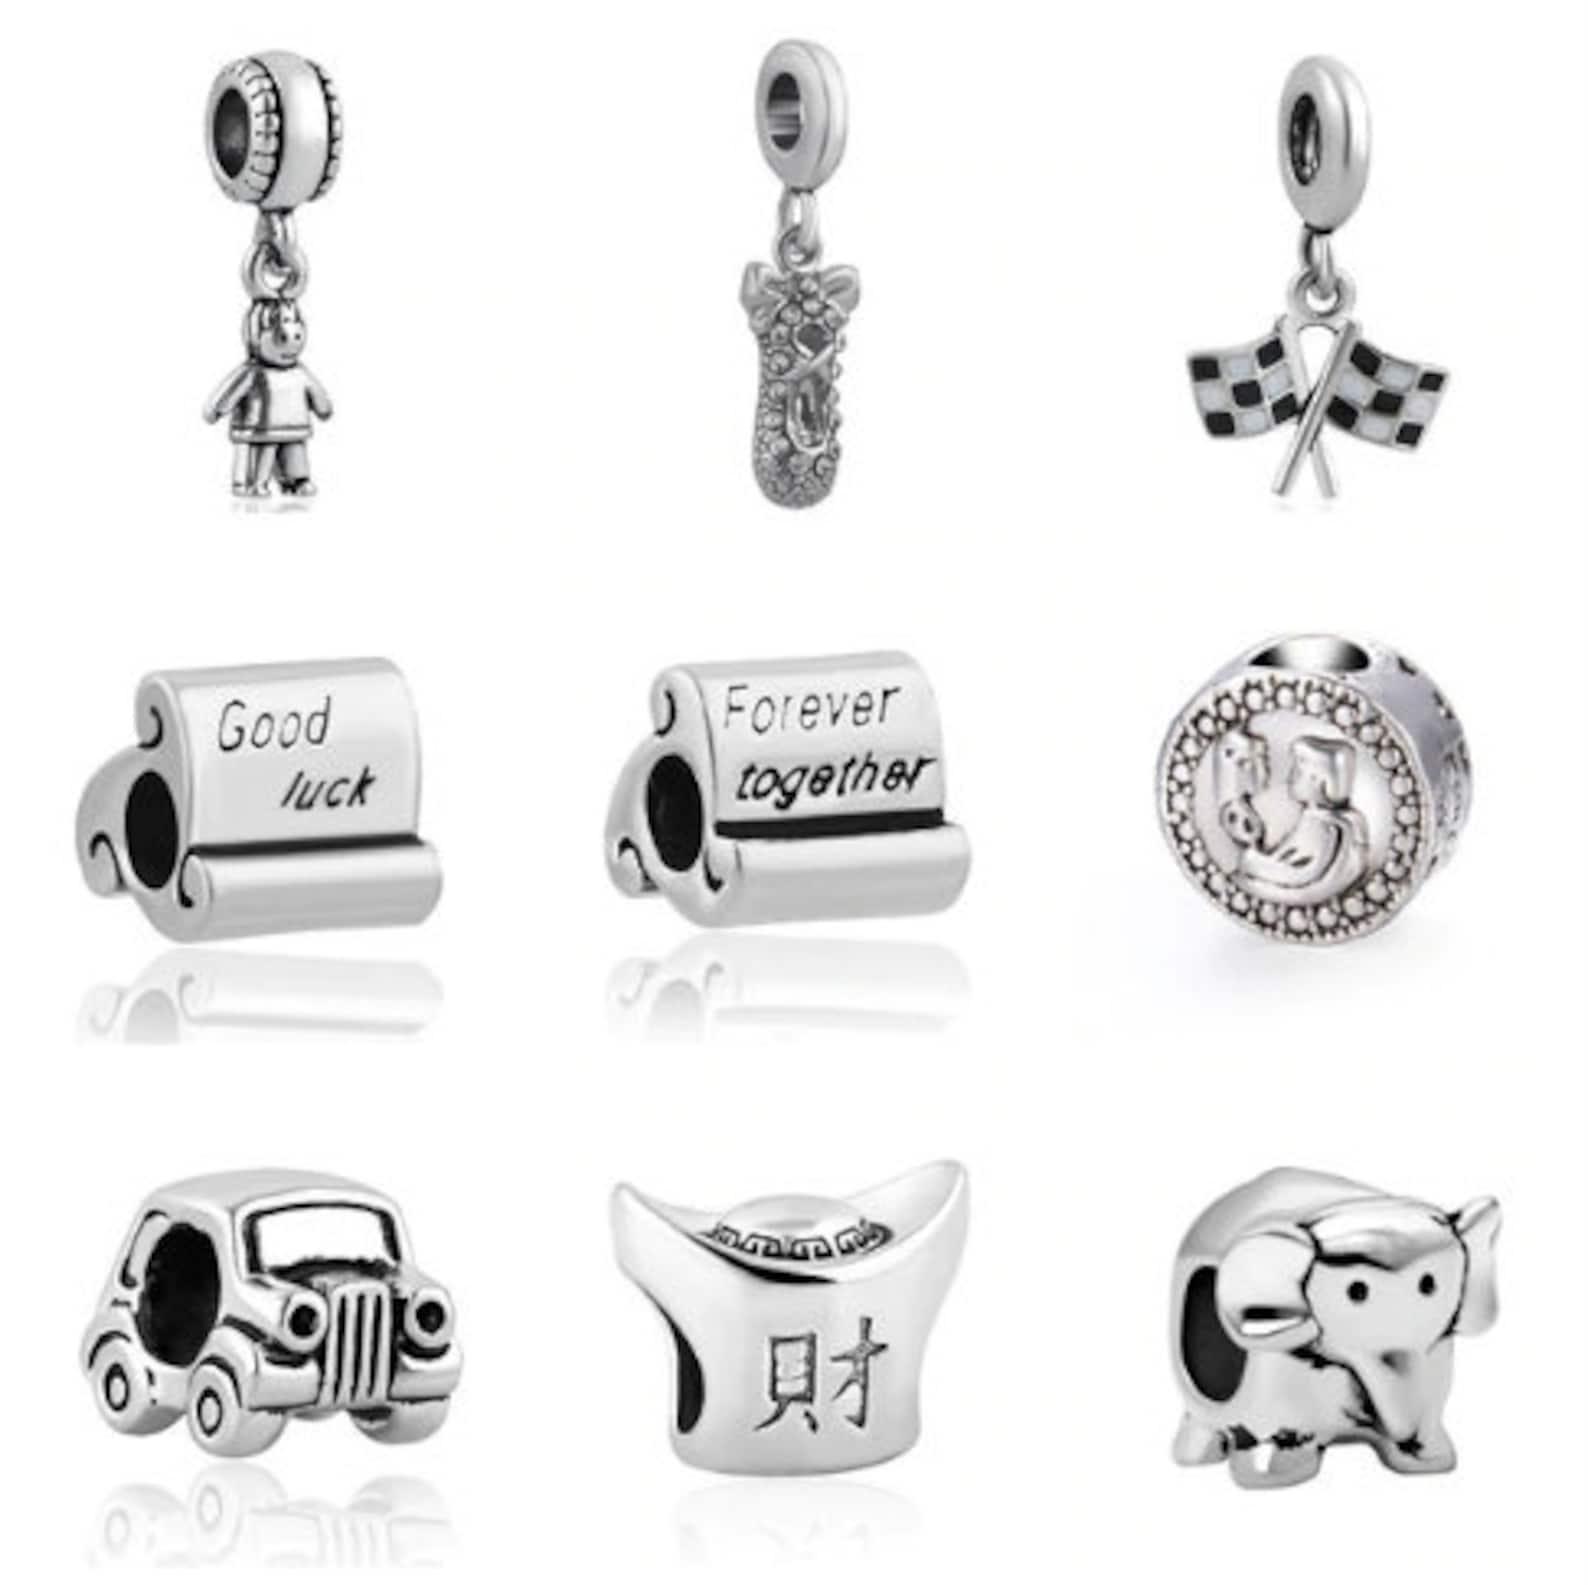 european silver girl ballet shoe flag good luck forever together car silber pendant beads fit original pandora charm bracelet je